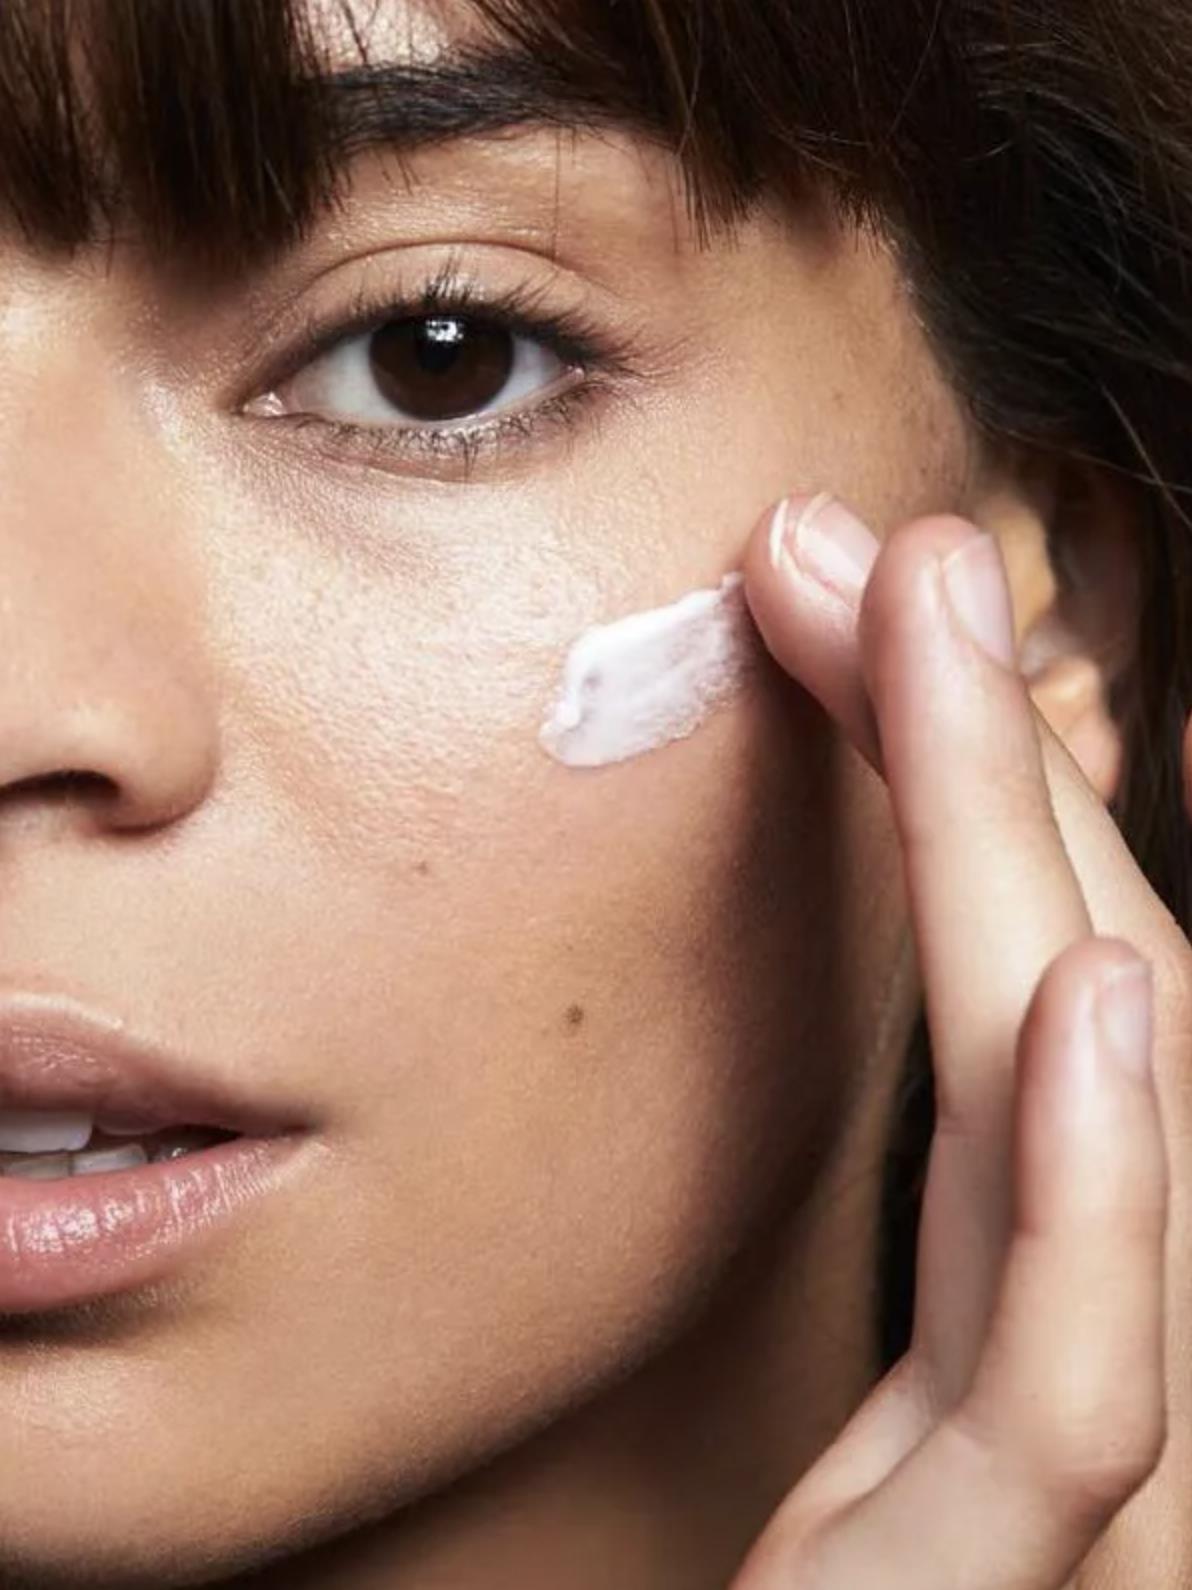 A model applying the moisturizer to their cheekbone